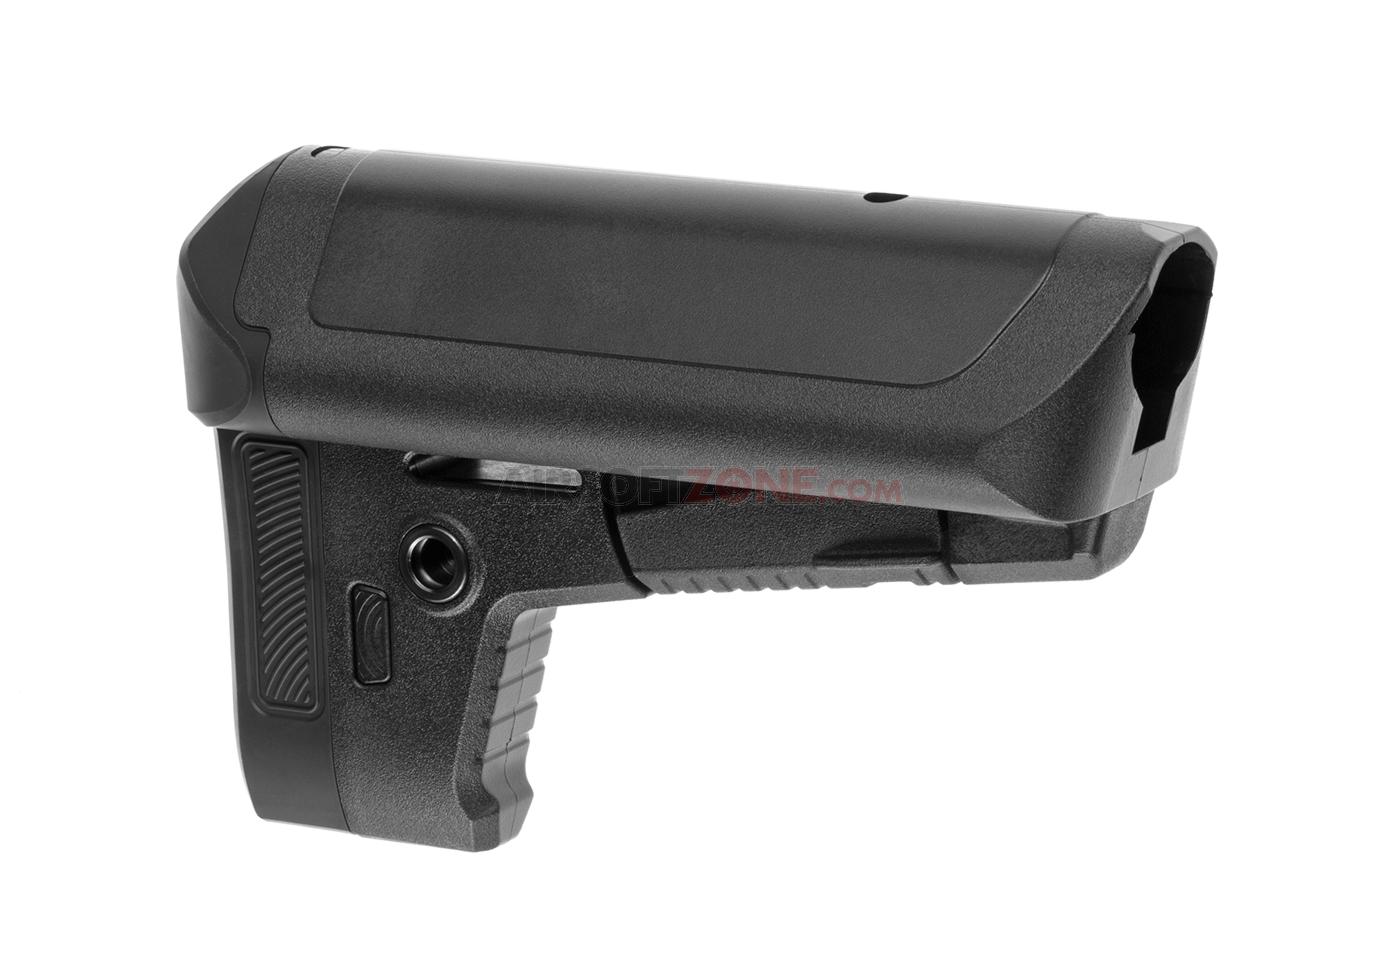 Adjustable Battery Stock